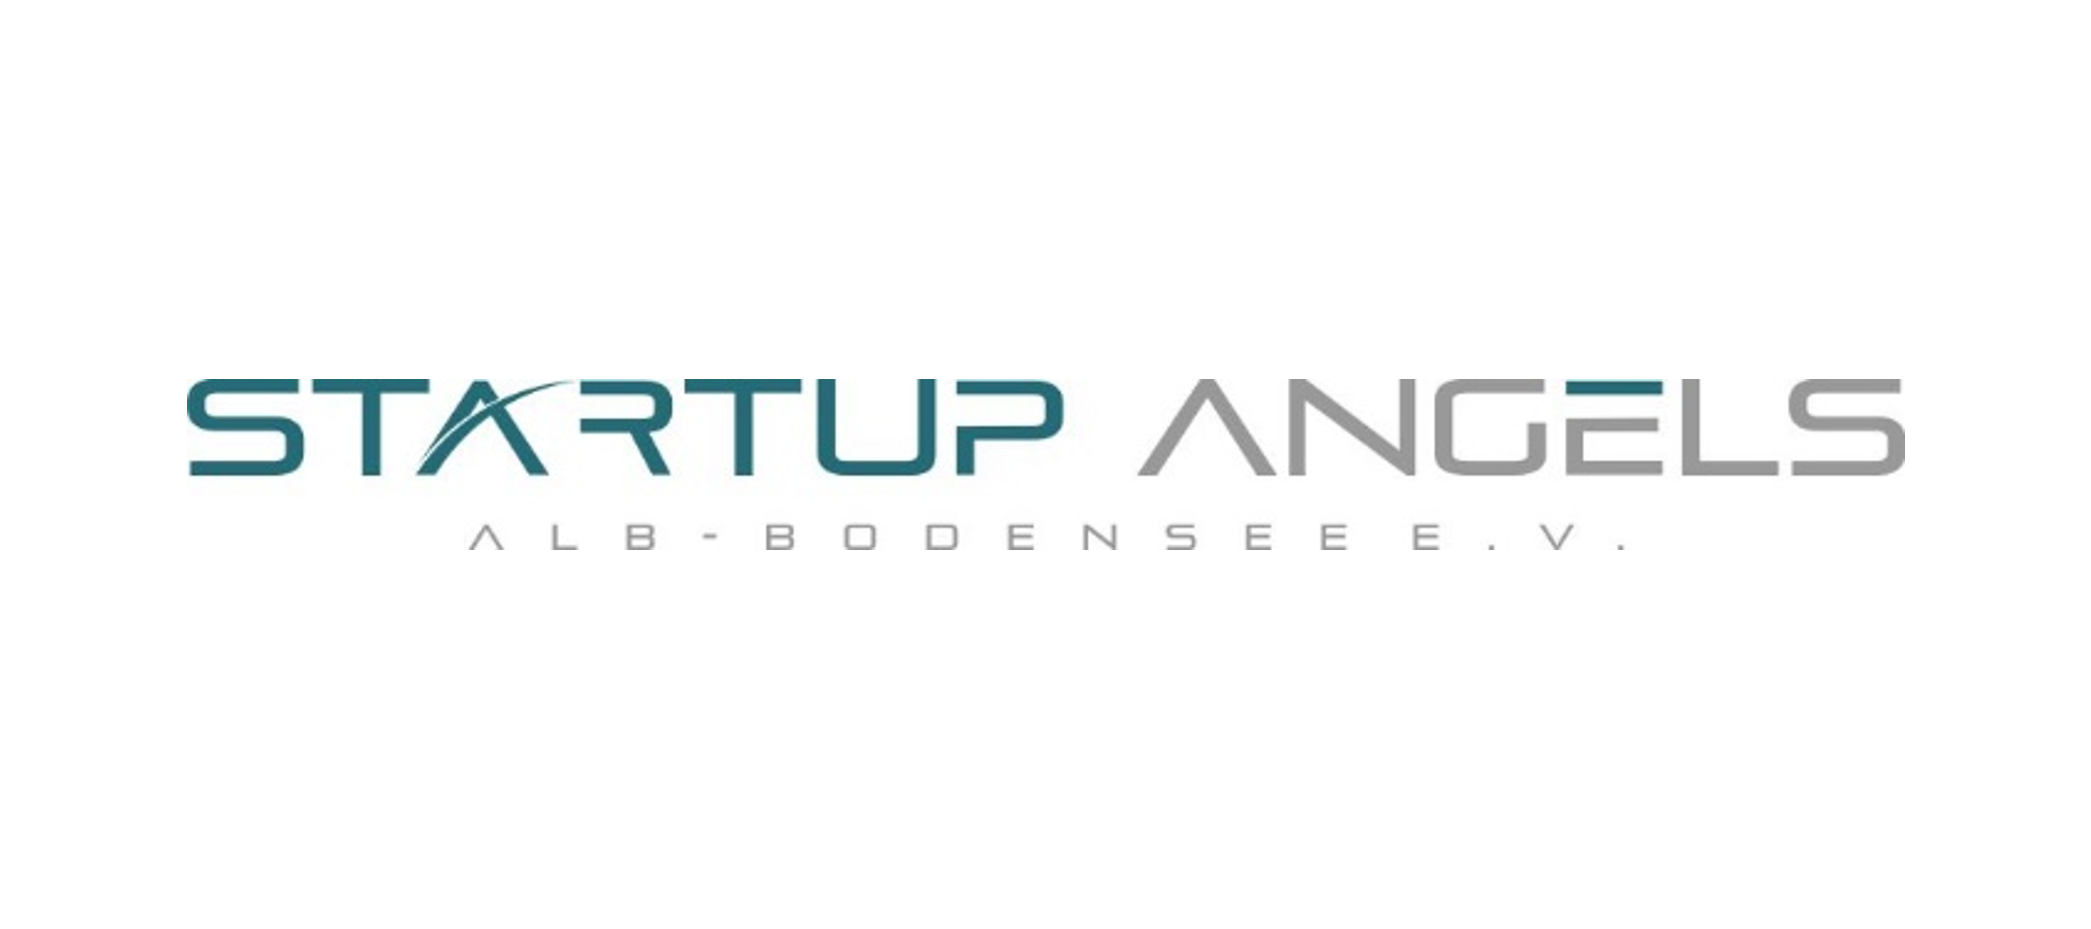 "<span style=""font-size:130%;""><a href=""https://startupangels.de/zollernalb-startups.html?language=de"" target=""_blank"">Startup Angels Alb-Bodensee</a></span>"